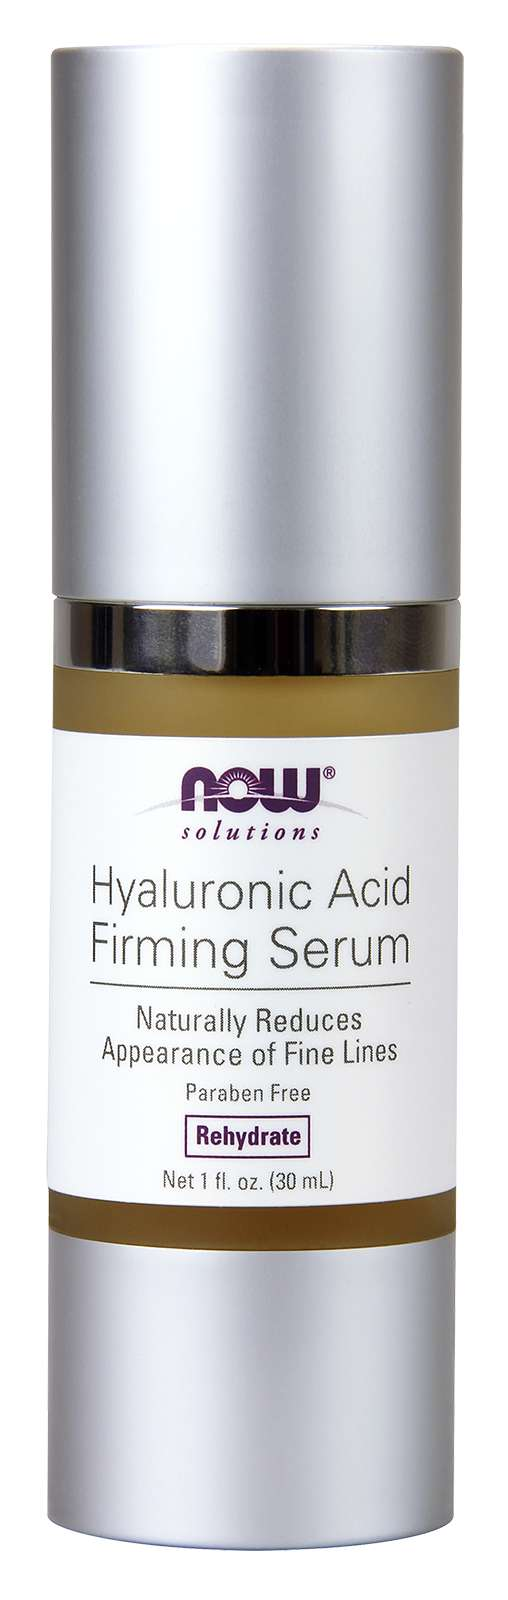 Hyaluronic Acid Firming Serum 30mL